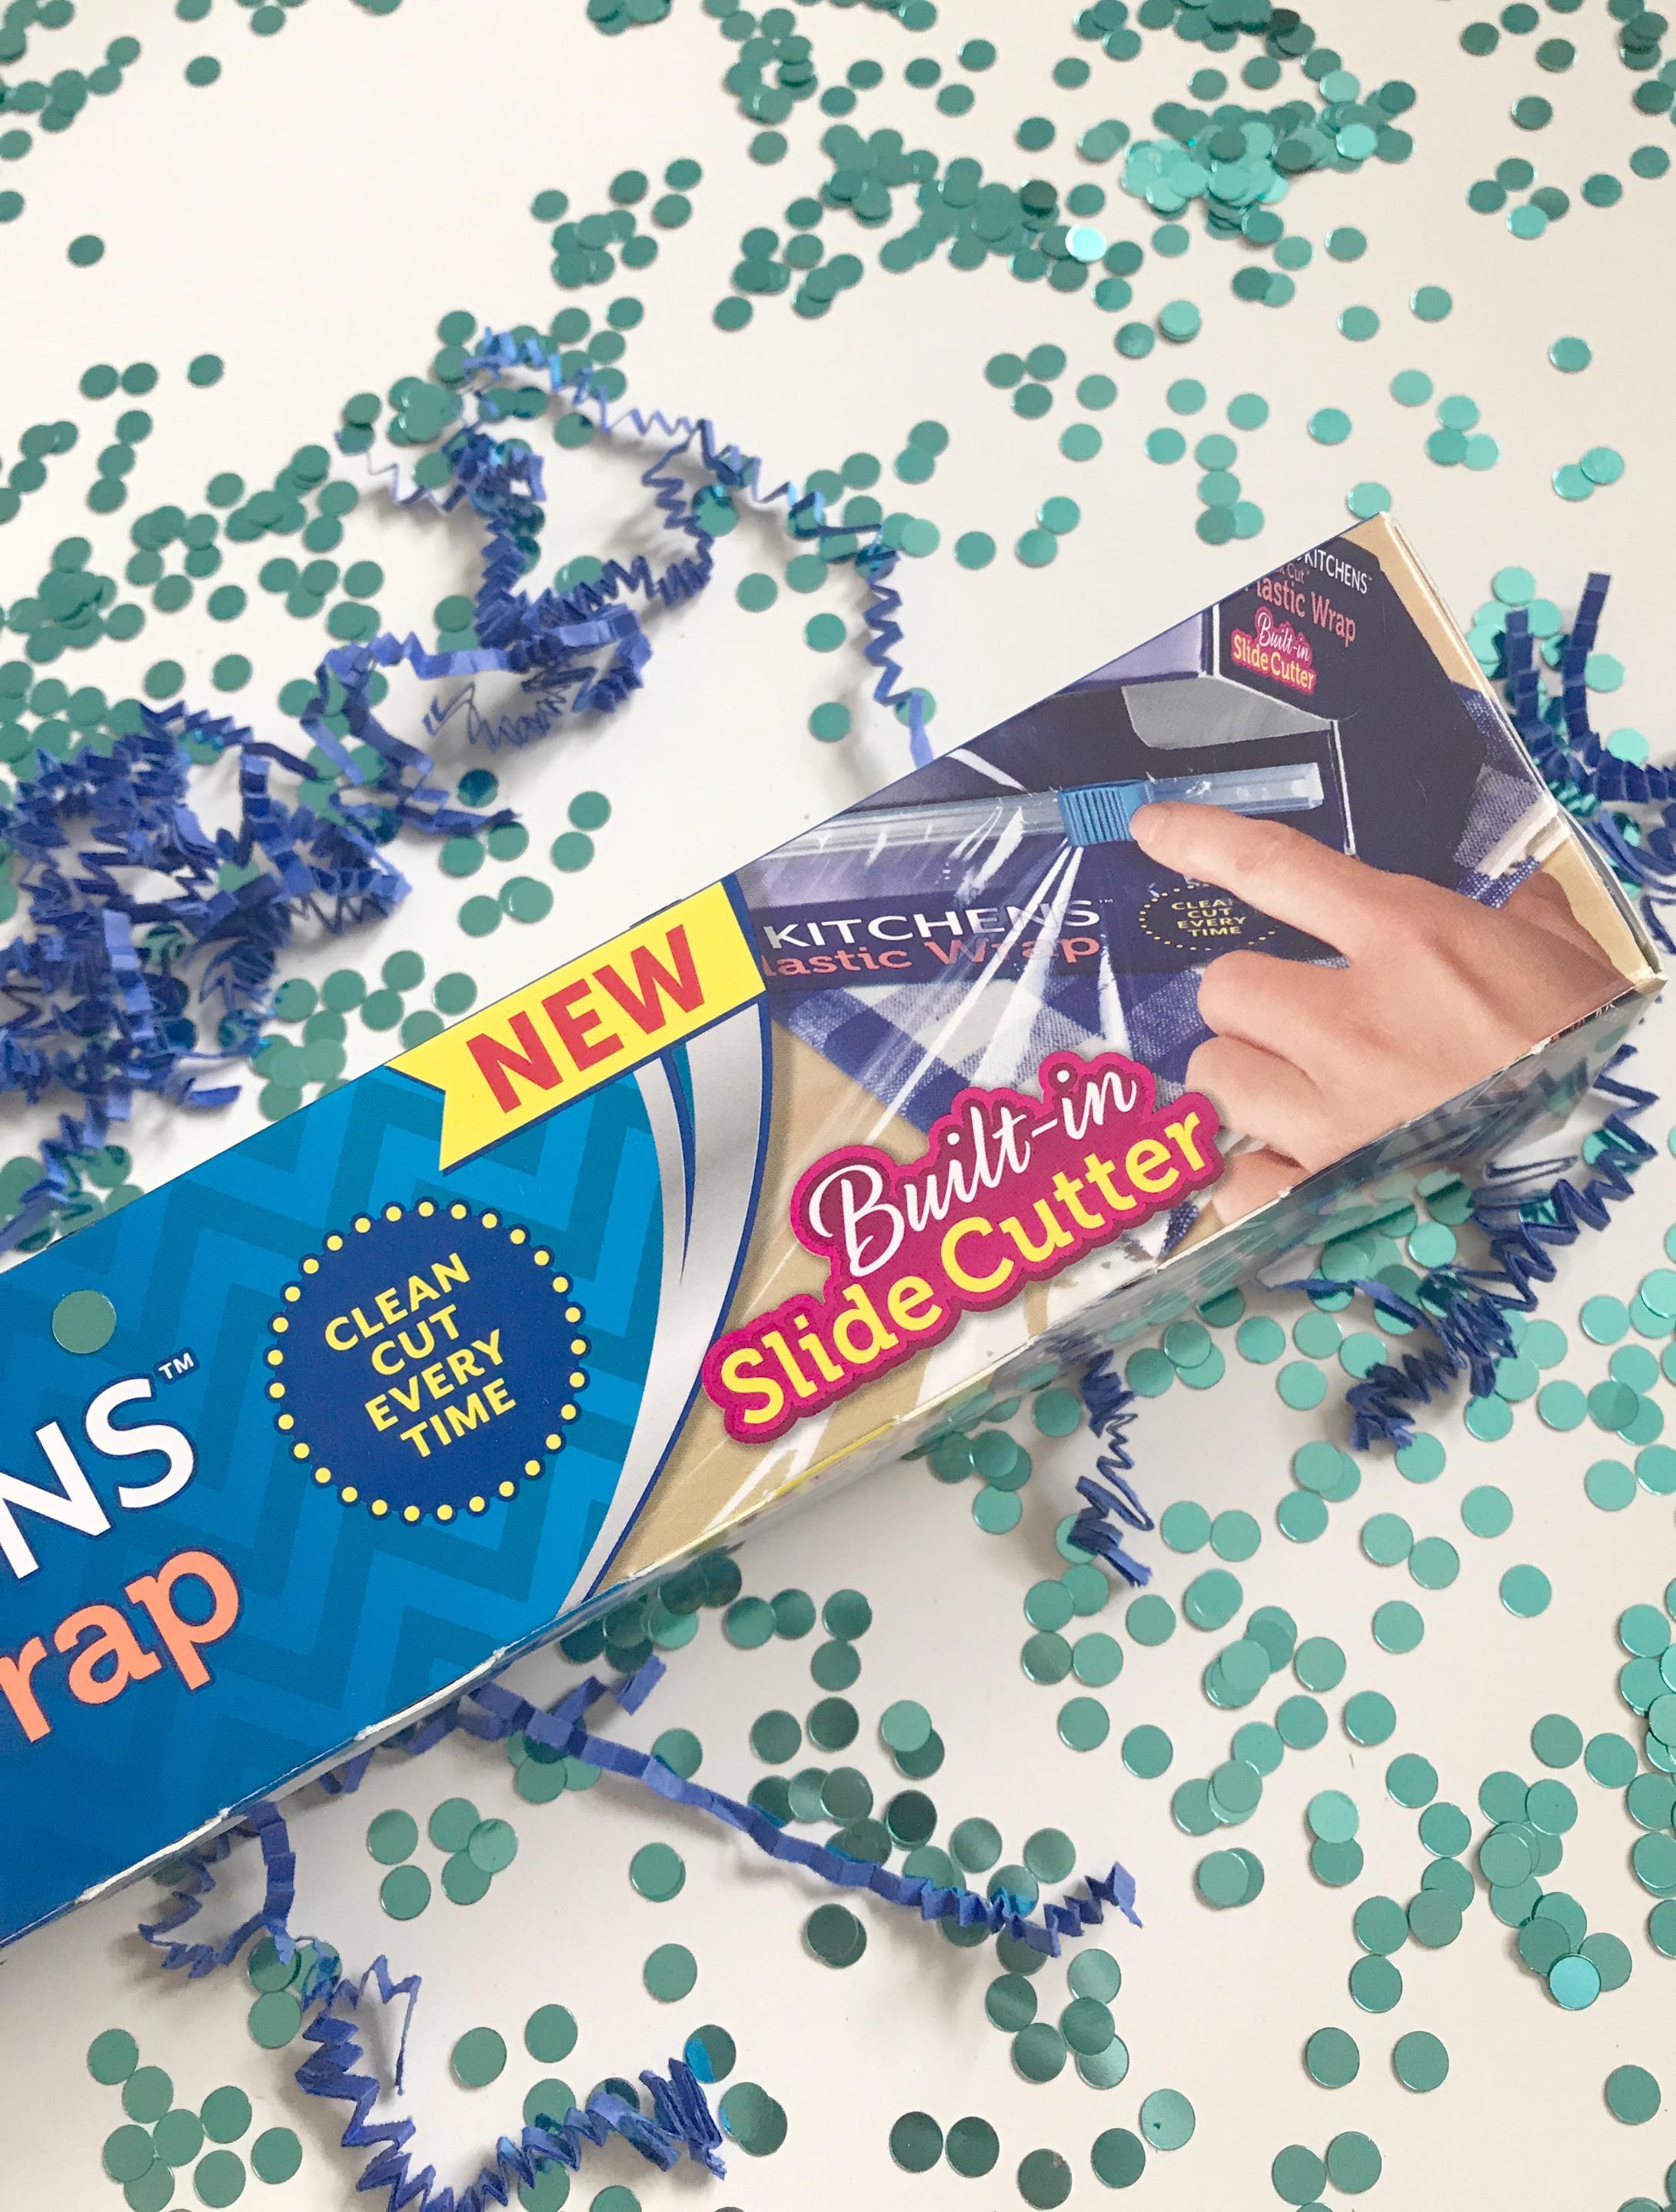 Reynolds KITCHENS™ QuickCut™ Plastic Wrap Hacks, plastic wrap hacks, cooking hacks with plastic wrap, how to use plastic wrap, plastic wrap hacks, tips for using plastic wrap